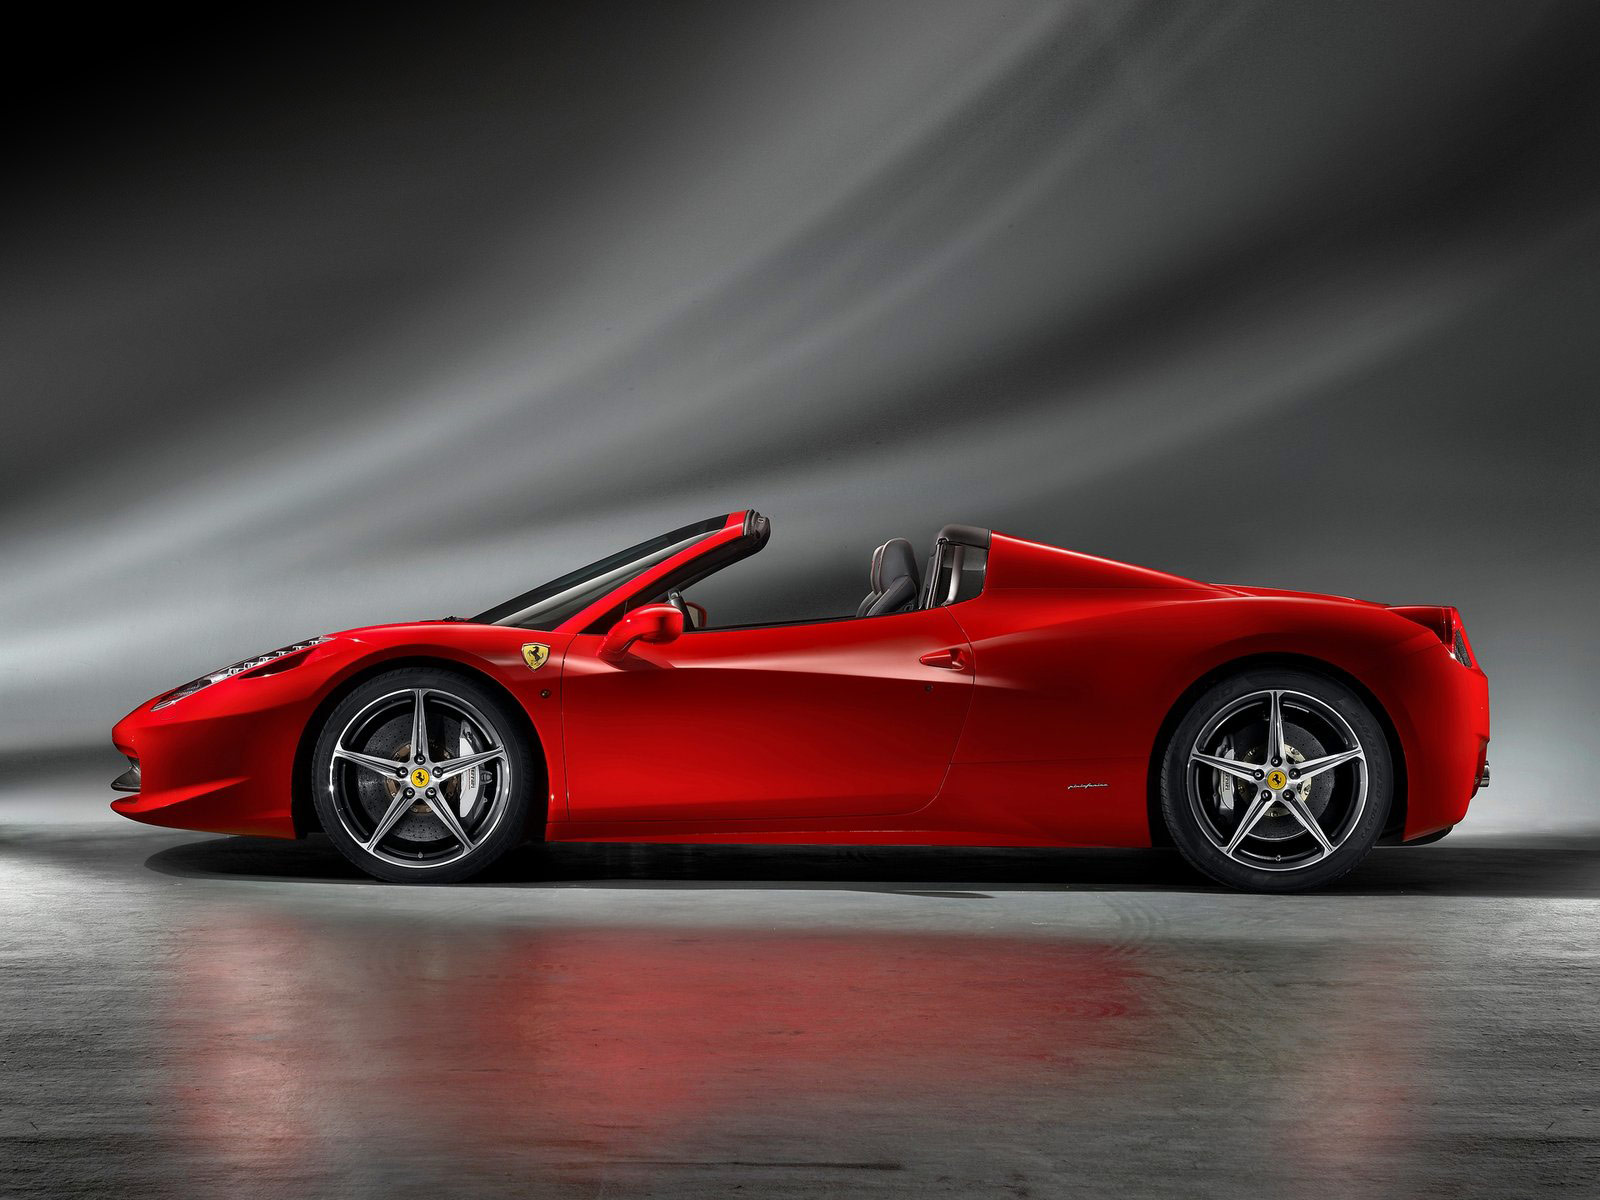 Pin 2012 Ferrari 458 Spider 3 Wallpaper Hd Car Wallpapers on Pinterest